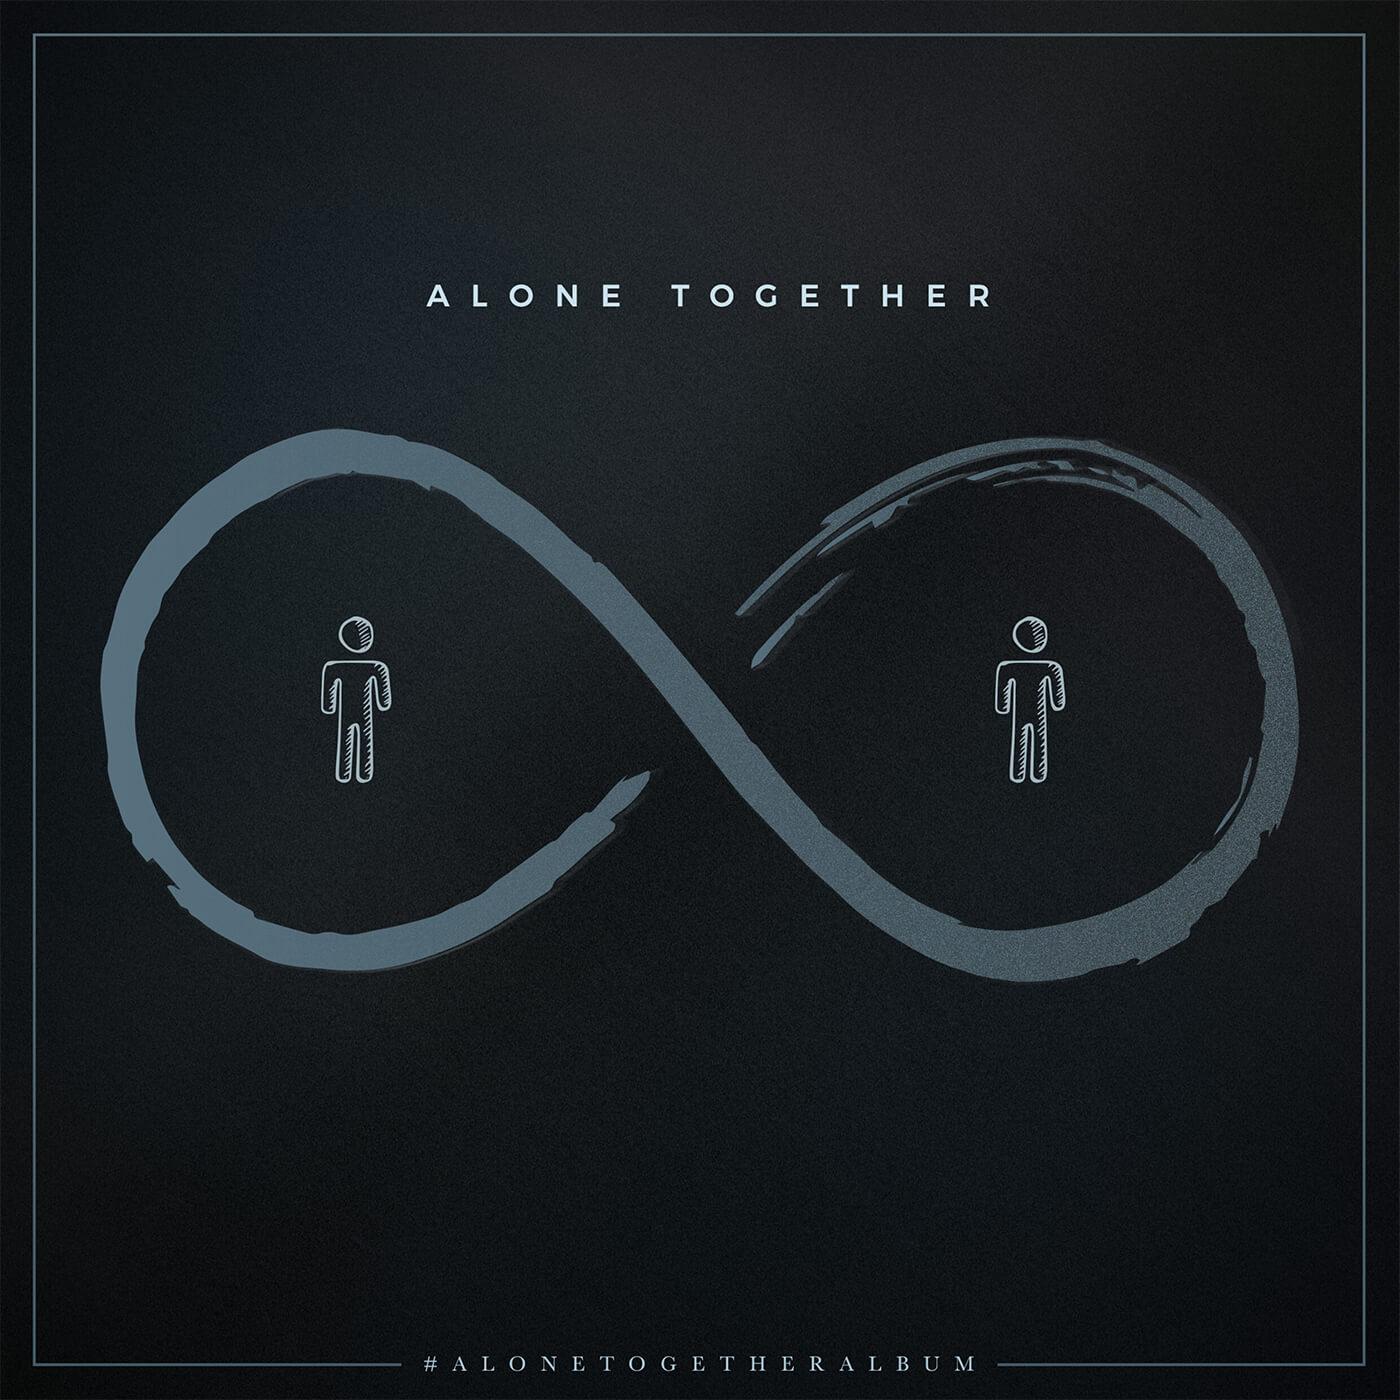 alone together album art